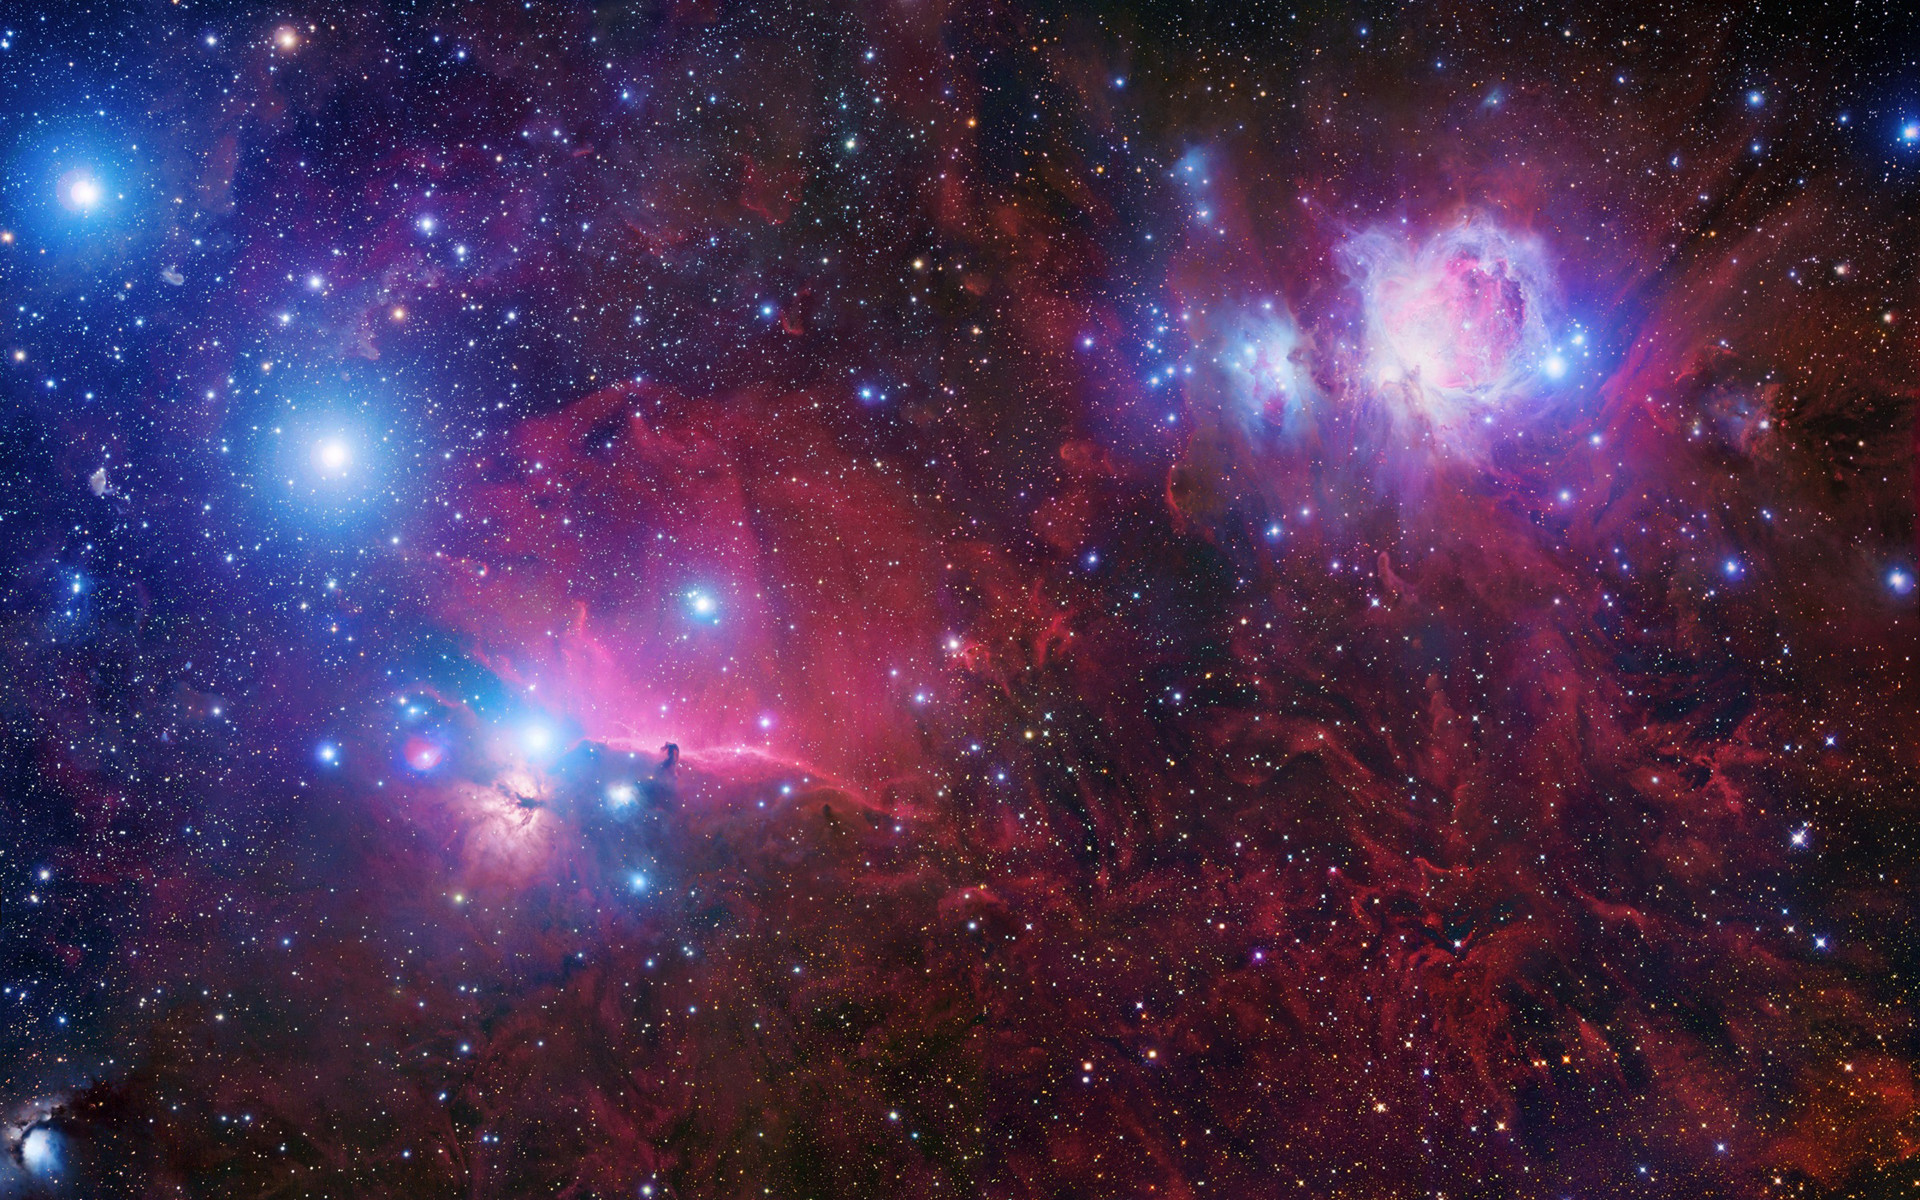 Galaxy-wallpapers-19.jpg